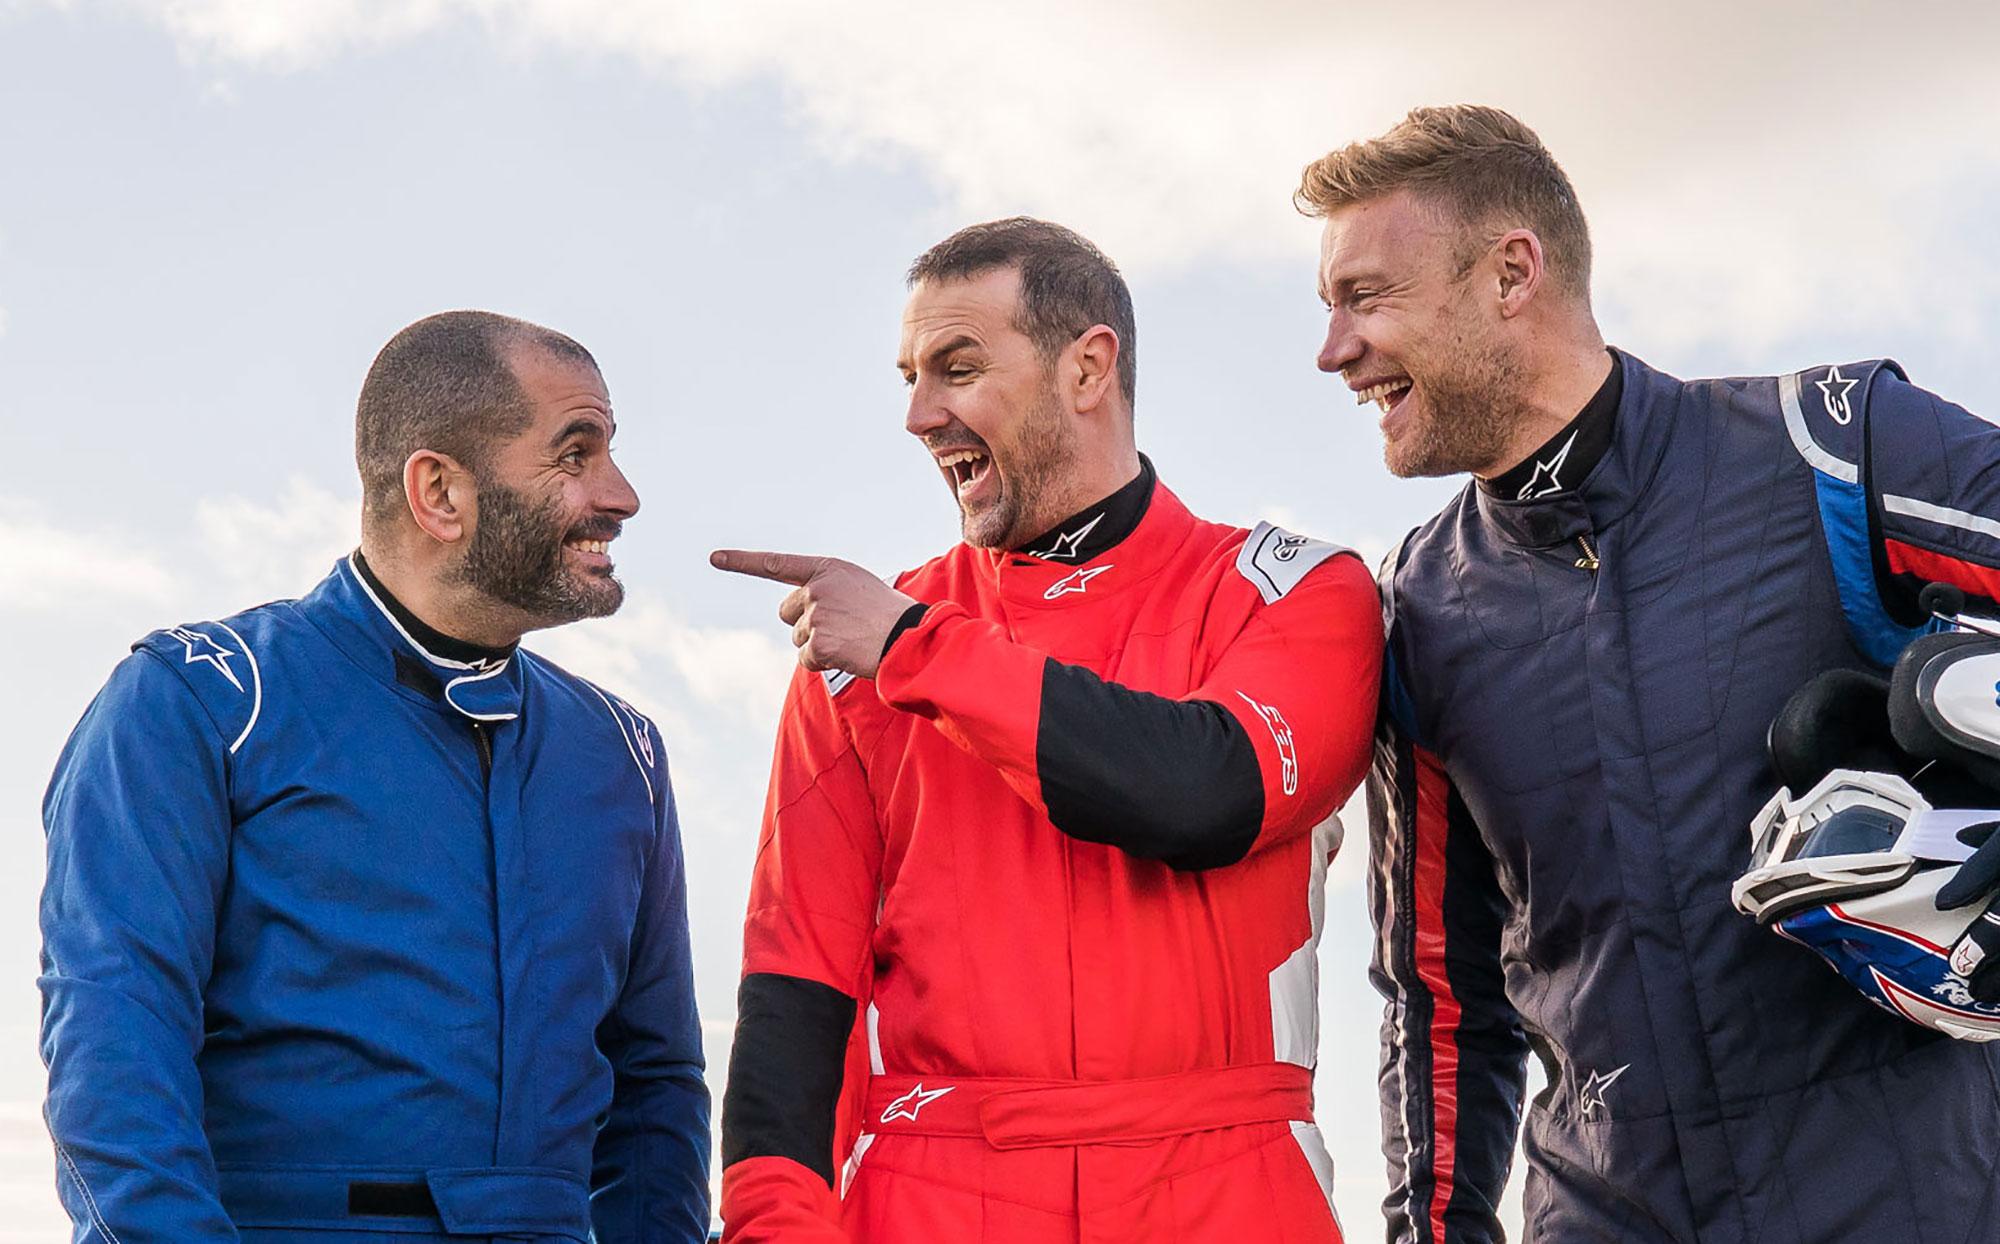 Chris Harris, Paddy McGuinness, Freddie Flintoff in new <i>Top Gear</i>. (BBC)